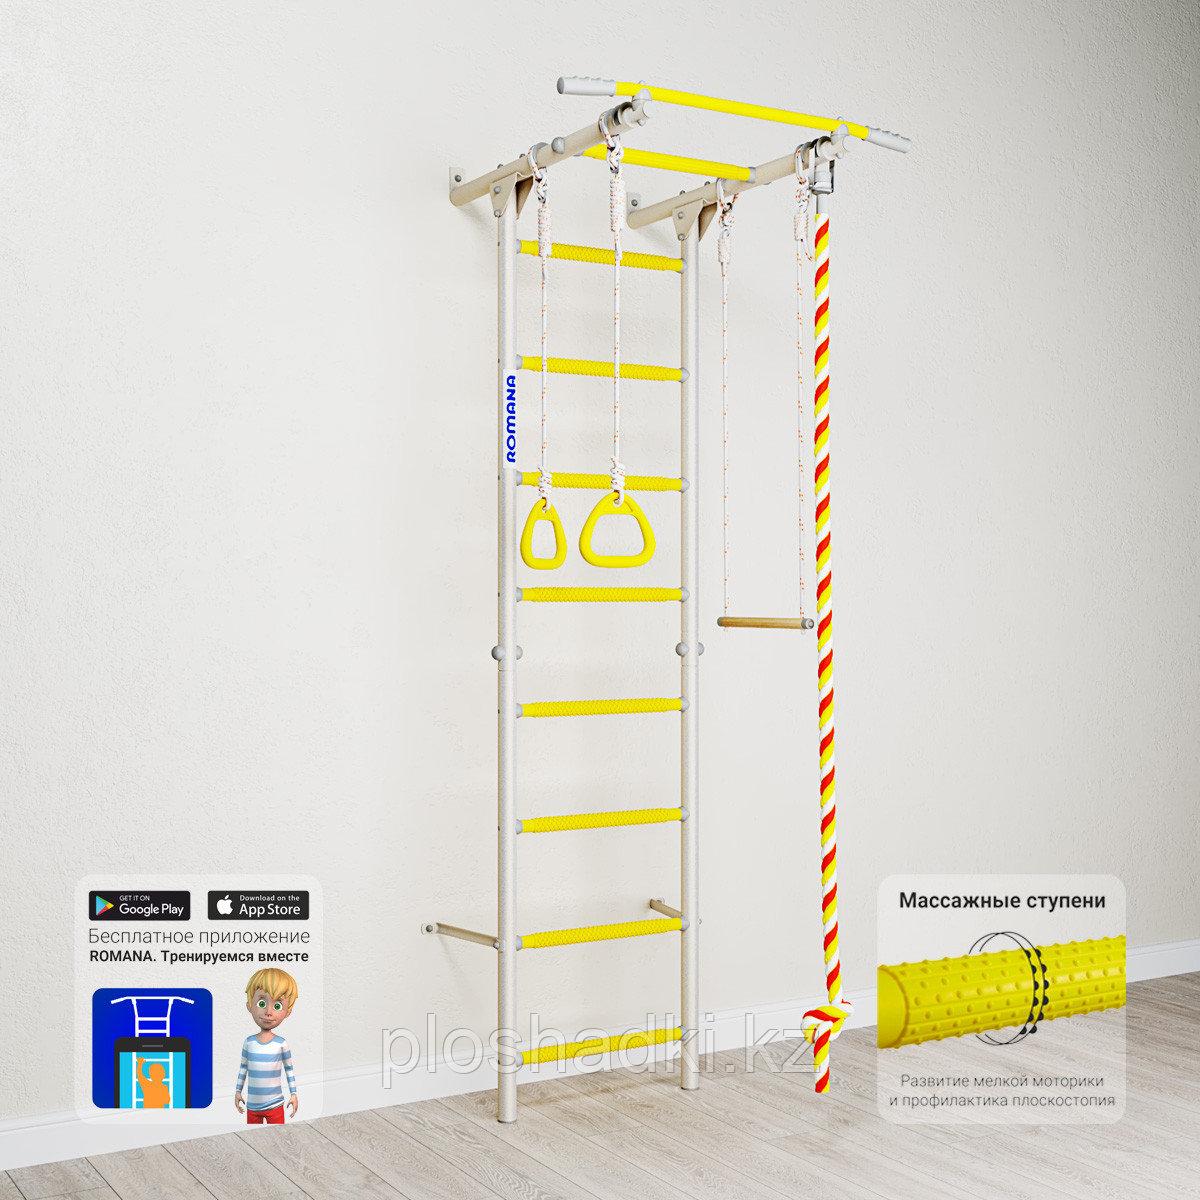 Шведская стенка Романа 0180, лестница гимнастическая, турник, канат, трапеция, кольца гимнастические